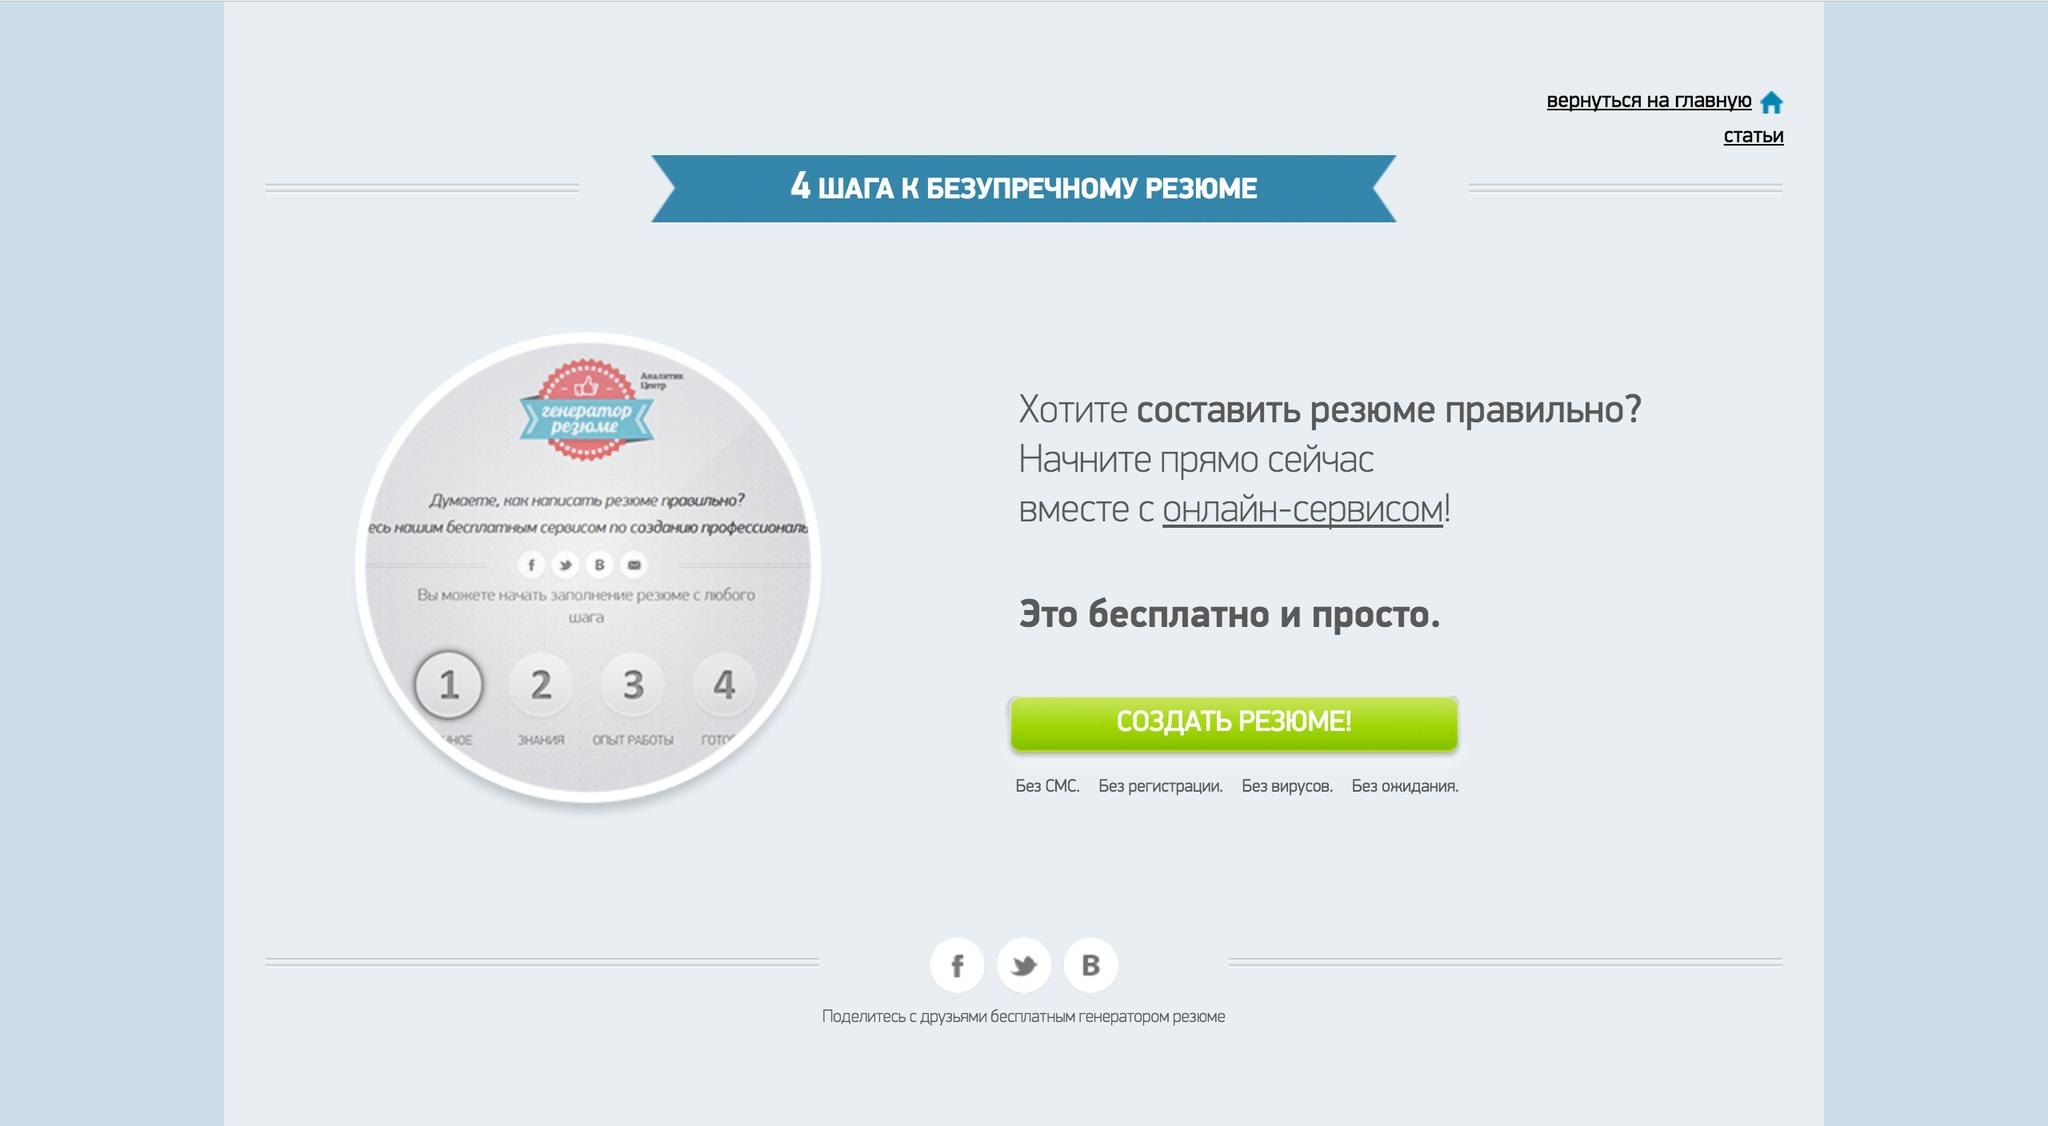 Составление резюме на acenter.ru